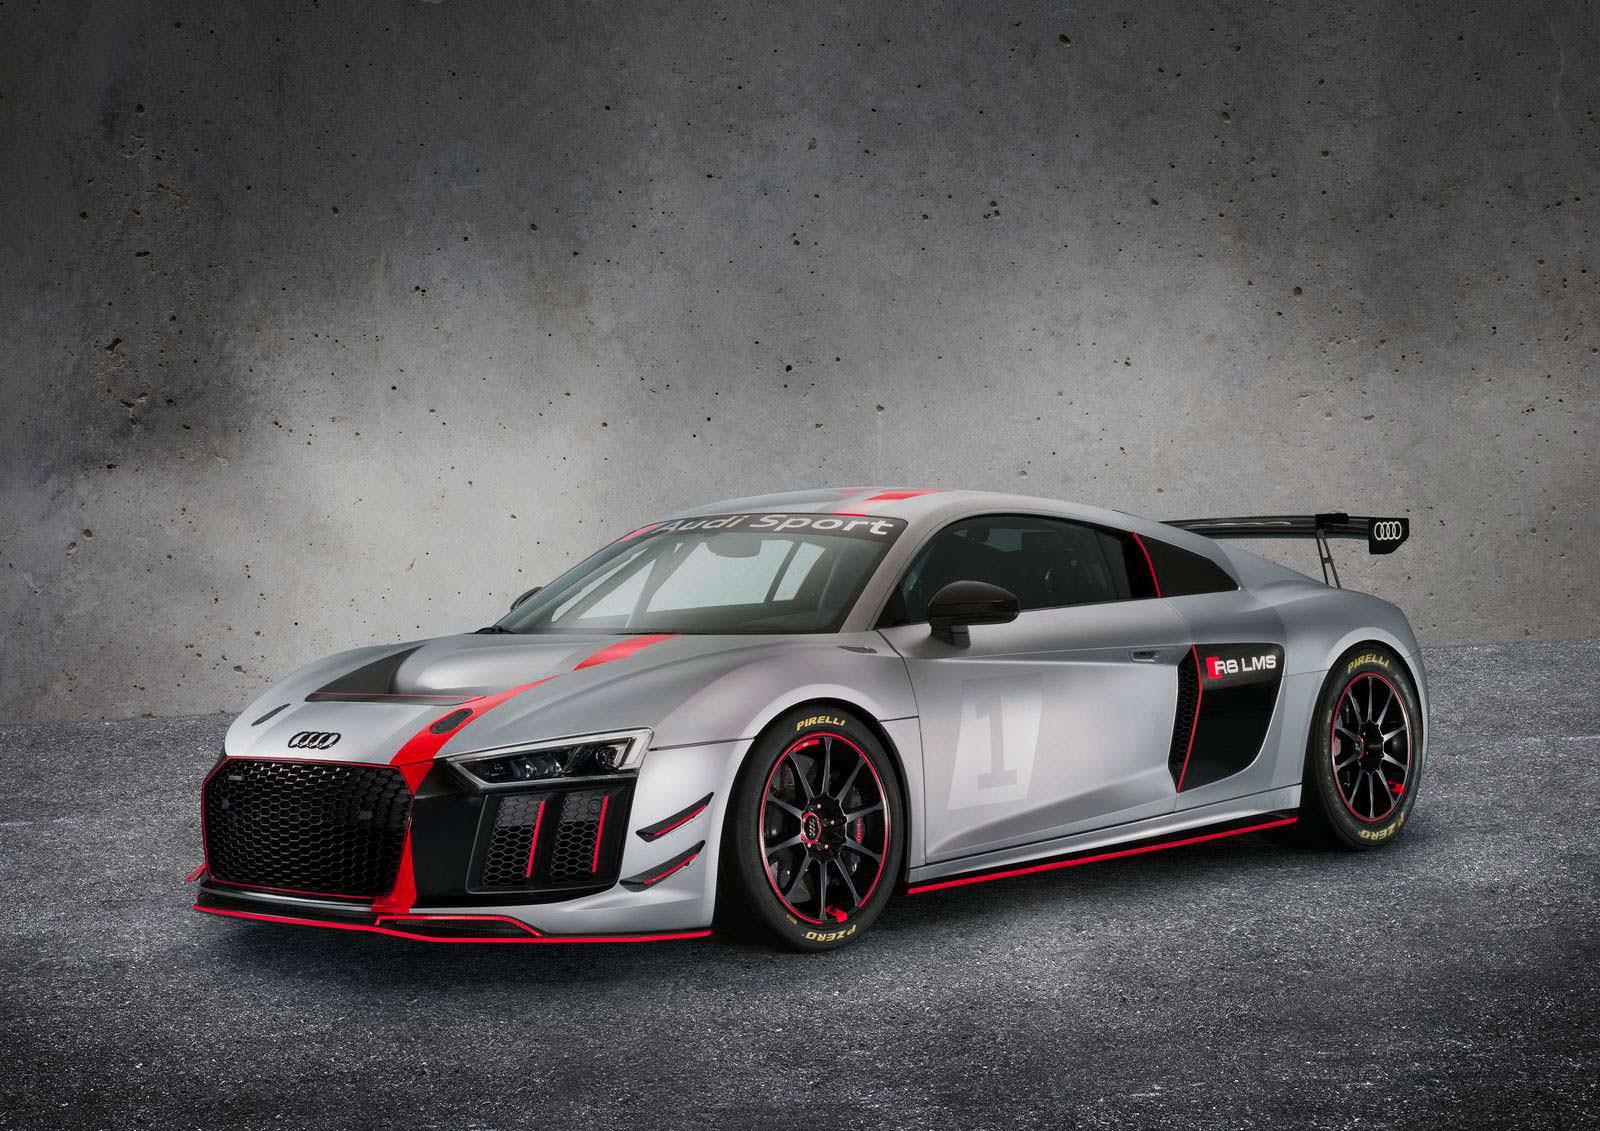 Фото   Audi R8 LMS: суперкар для гонок в категории GT4